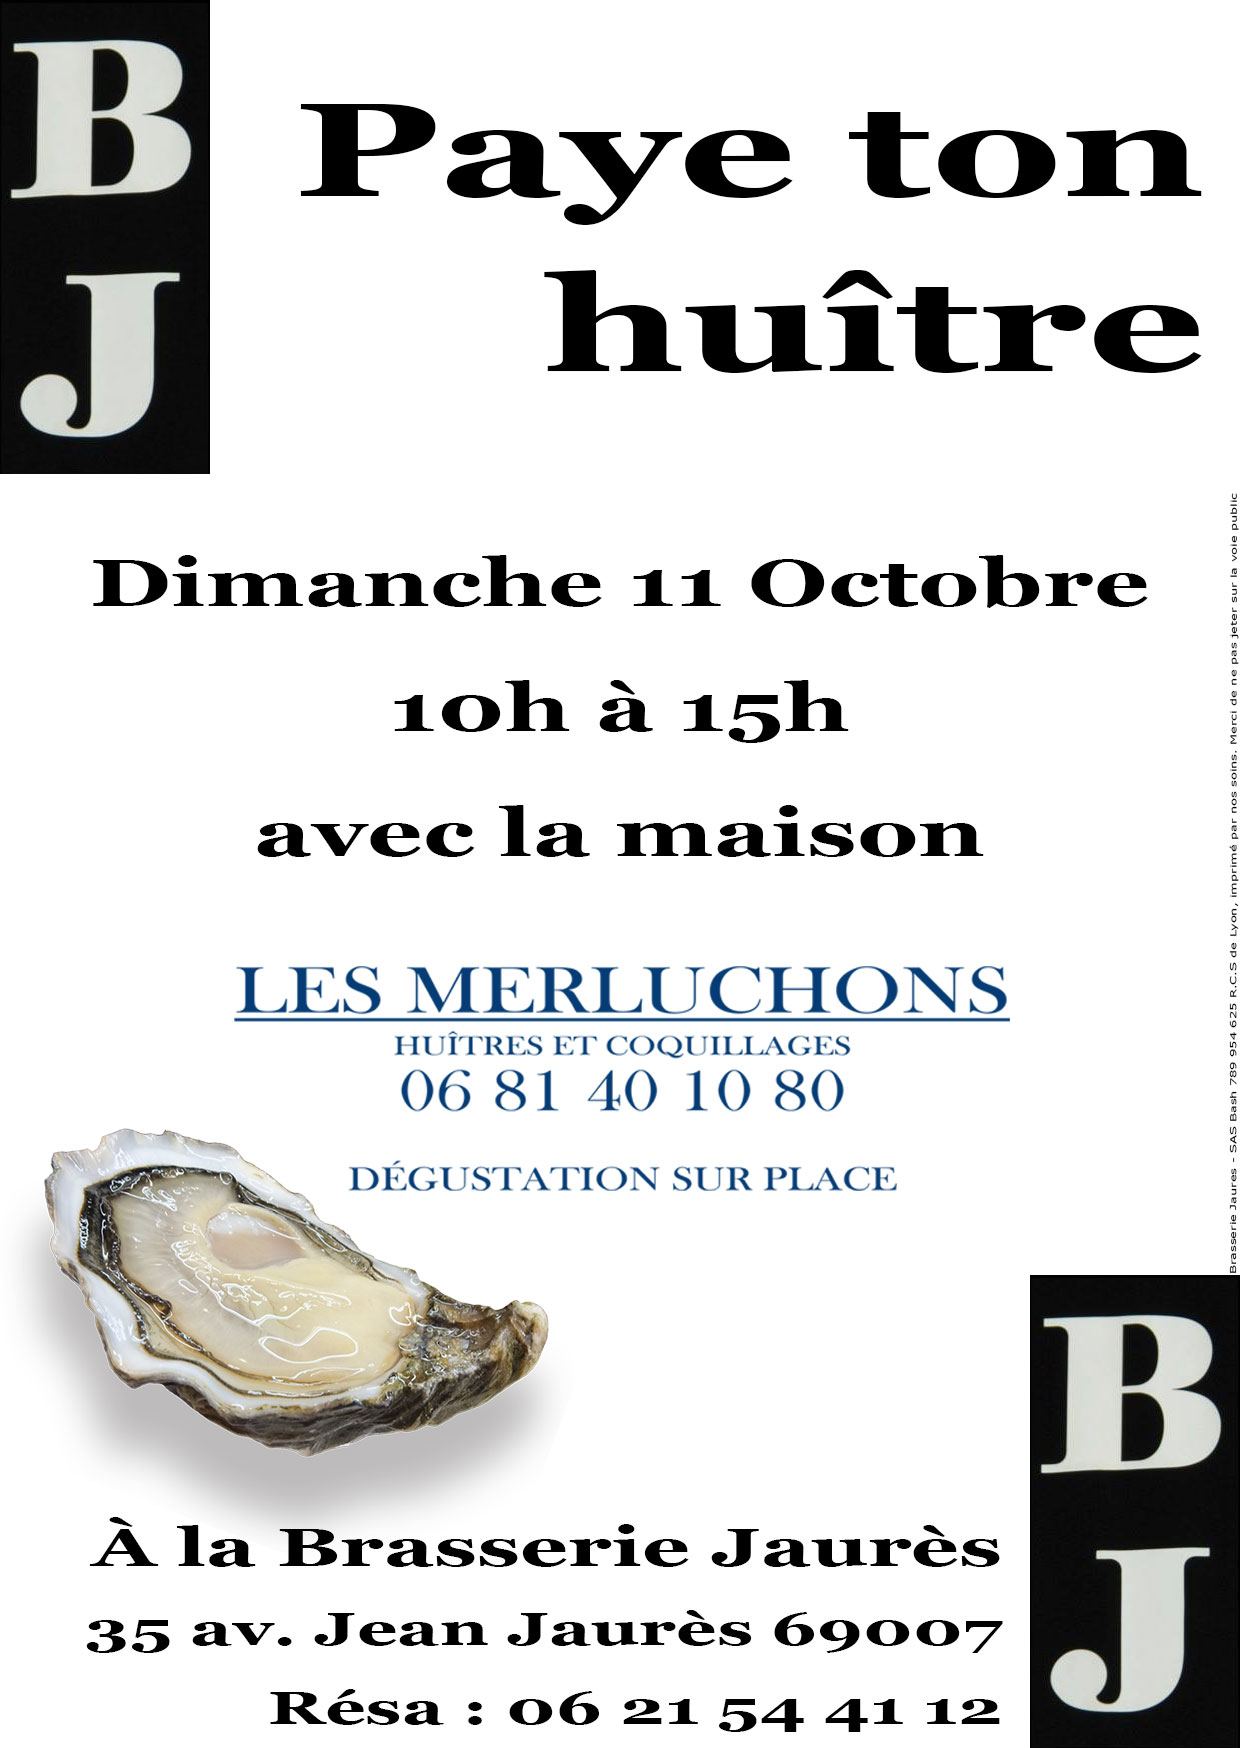 Brasserie Jaurès Paye ton huître